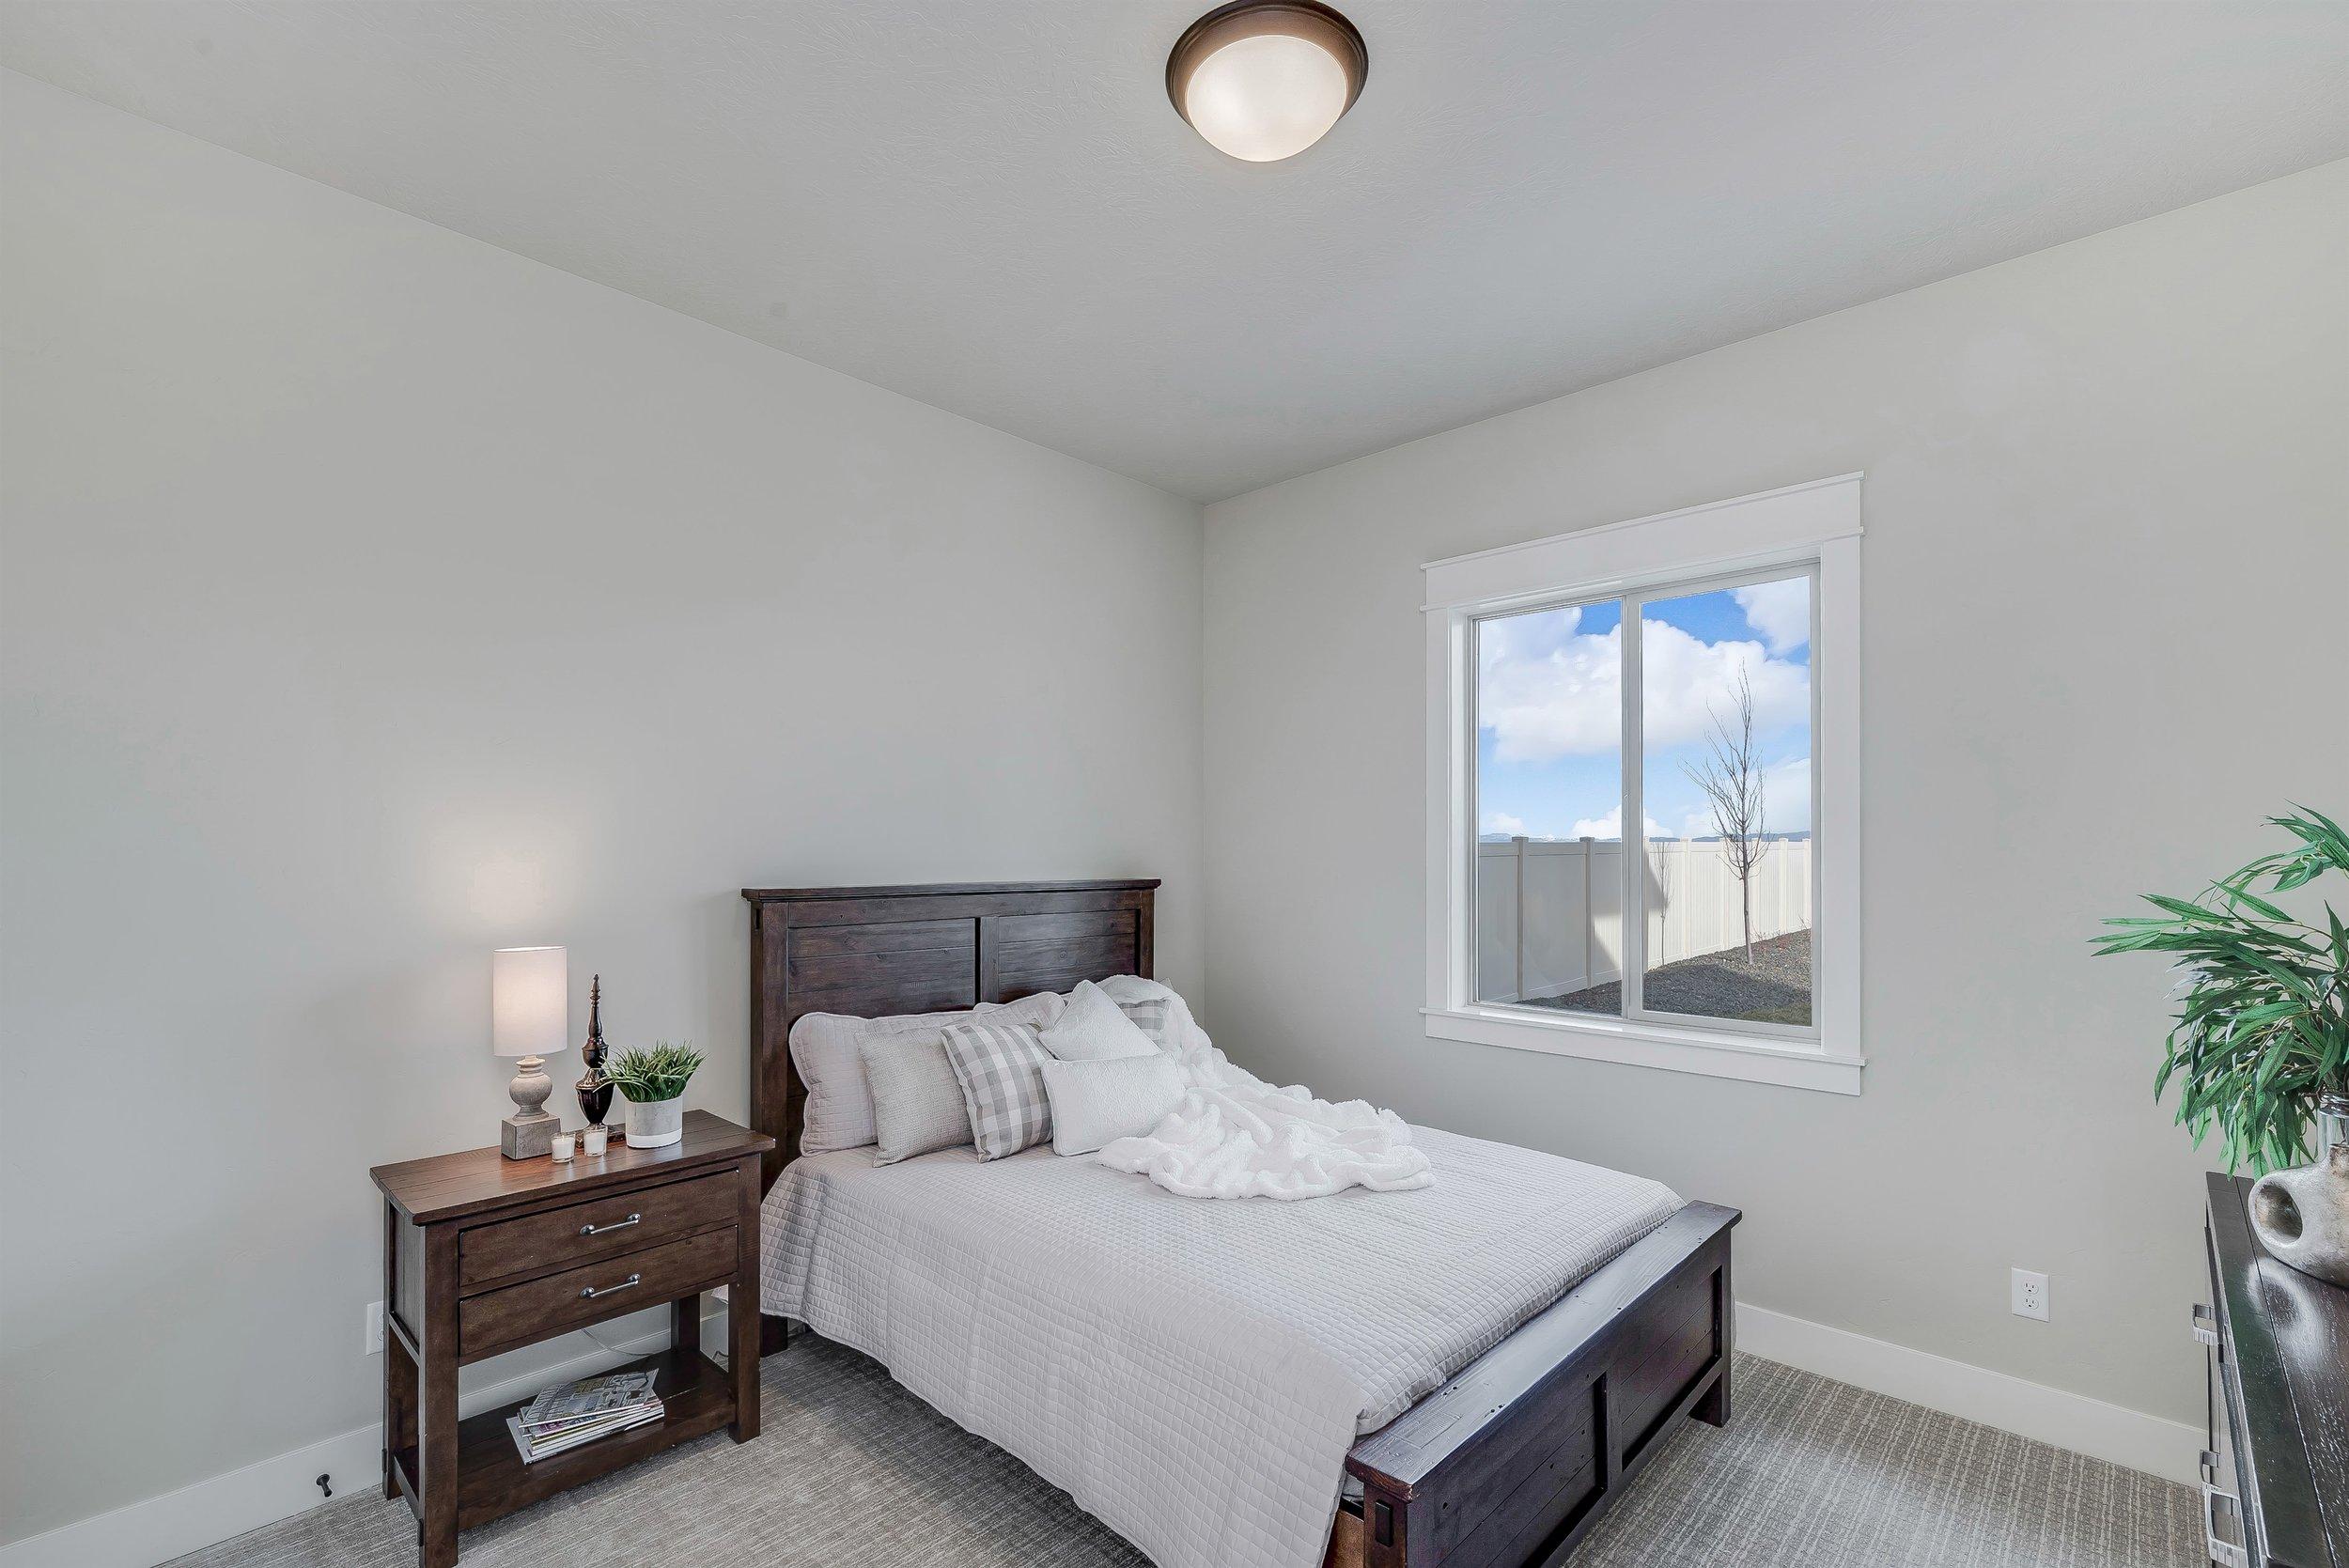 049_Bedroom.jpg